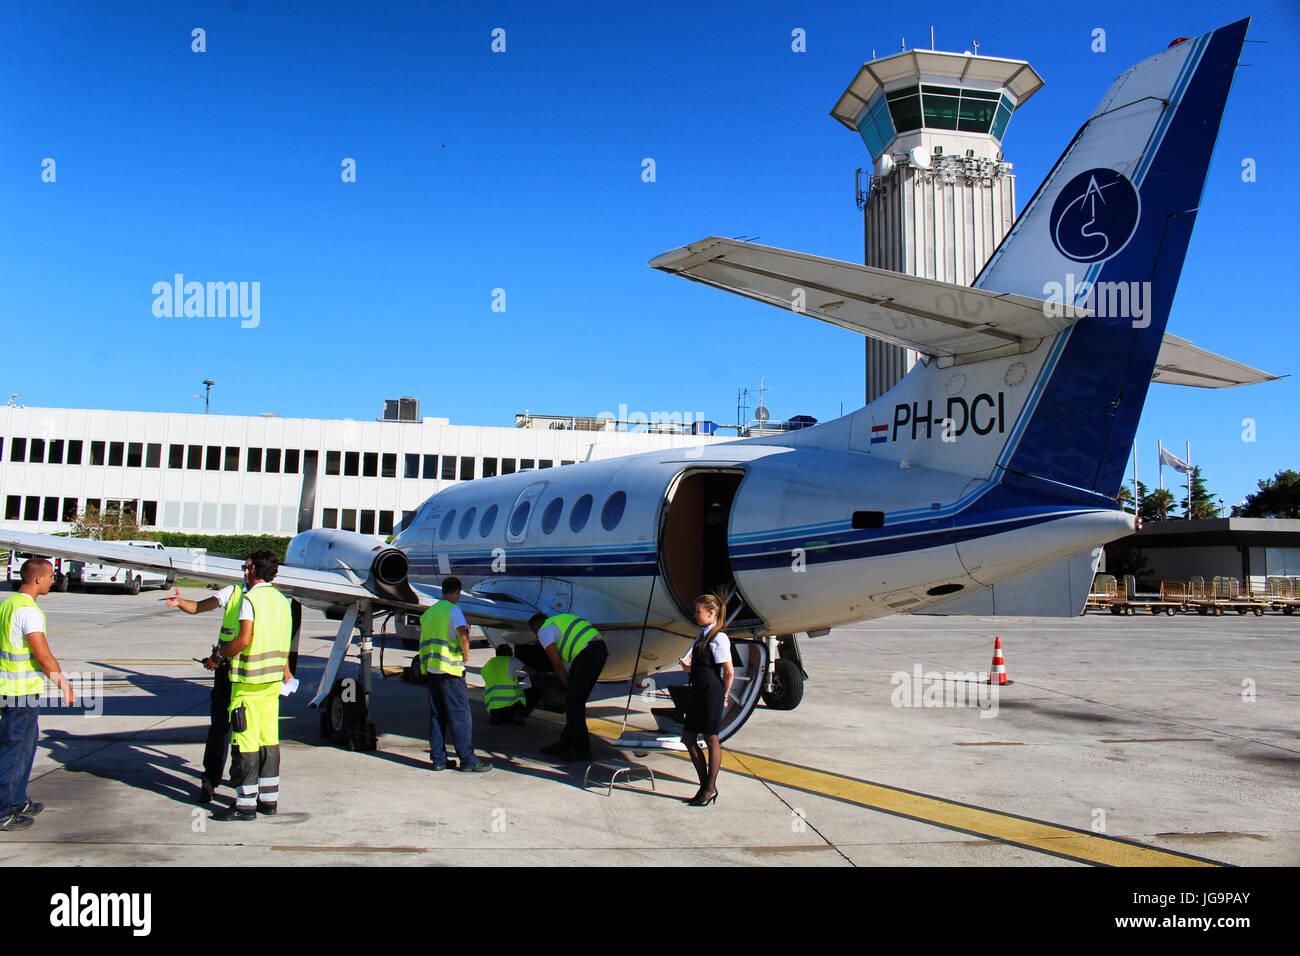 SPLIT/CROATIA - 29 JUNE 2017: A British Aerospace Jetstream 32 by Trade Air ready to operate a flight for croatian - Stock Image